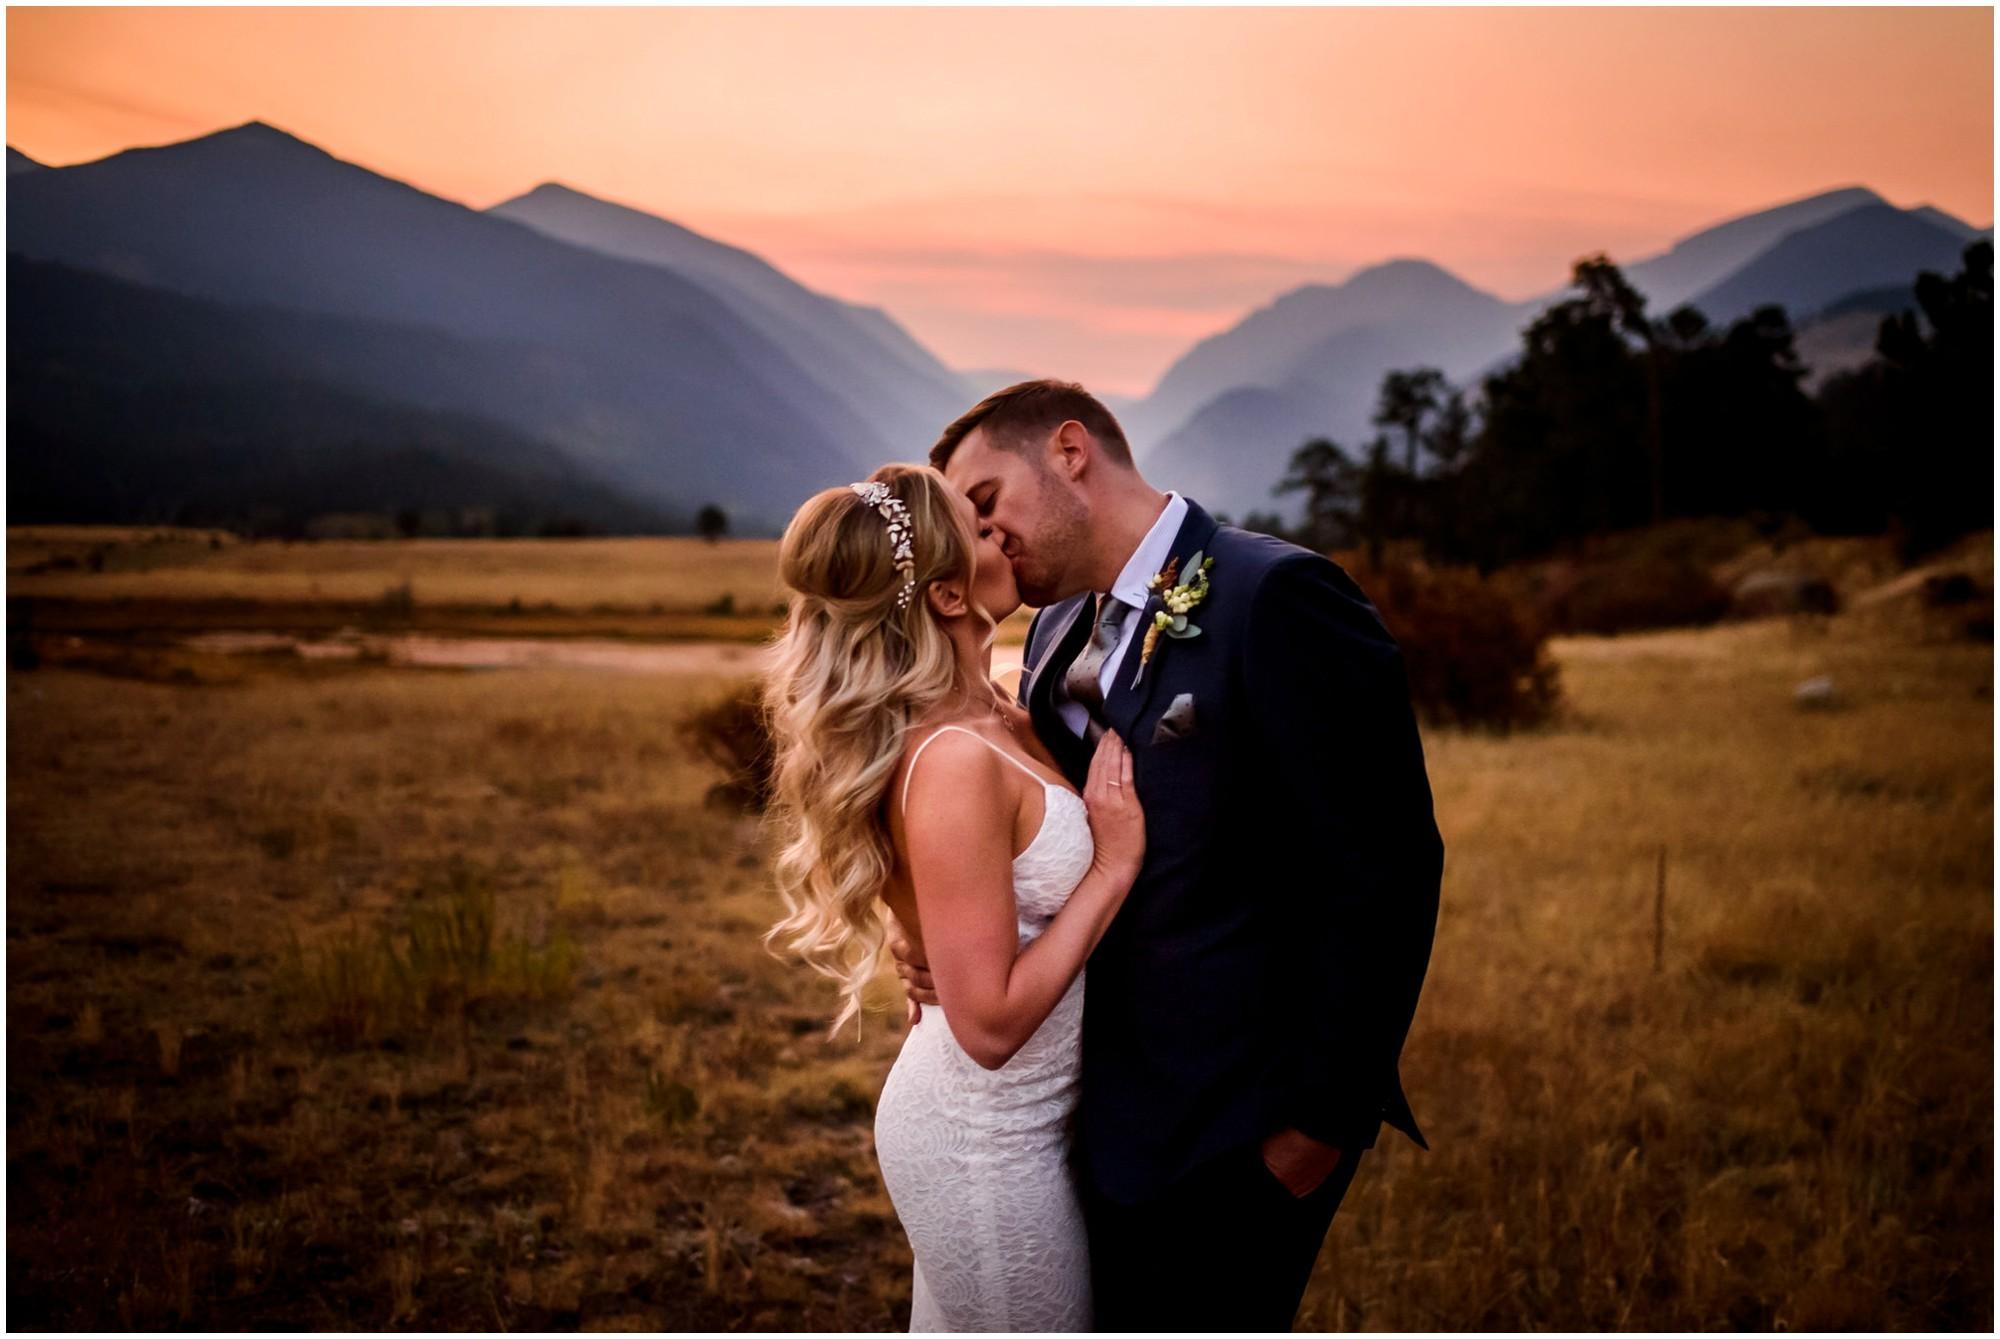 543-Rocky-mountain-national-park-elopement-photography.jpg